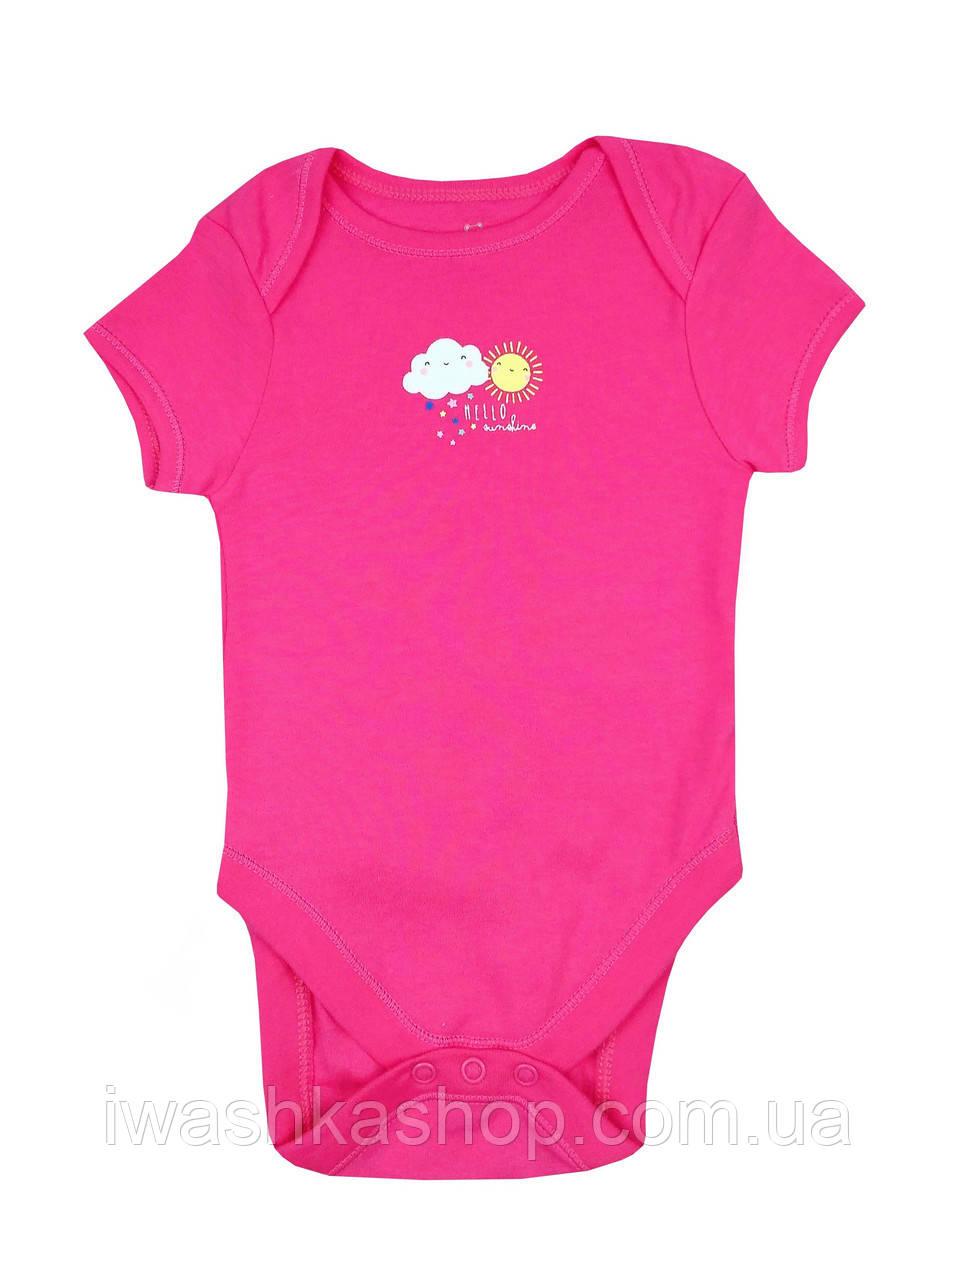 Яркое малиновое боди с коротким рукавом для девочки 6 - 9 месяцев, р. 74, Early days by Primark, Германия